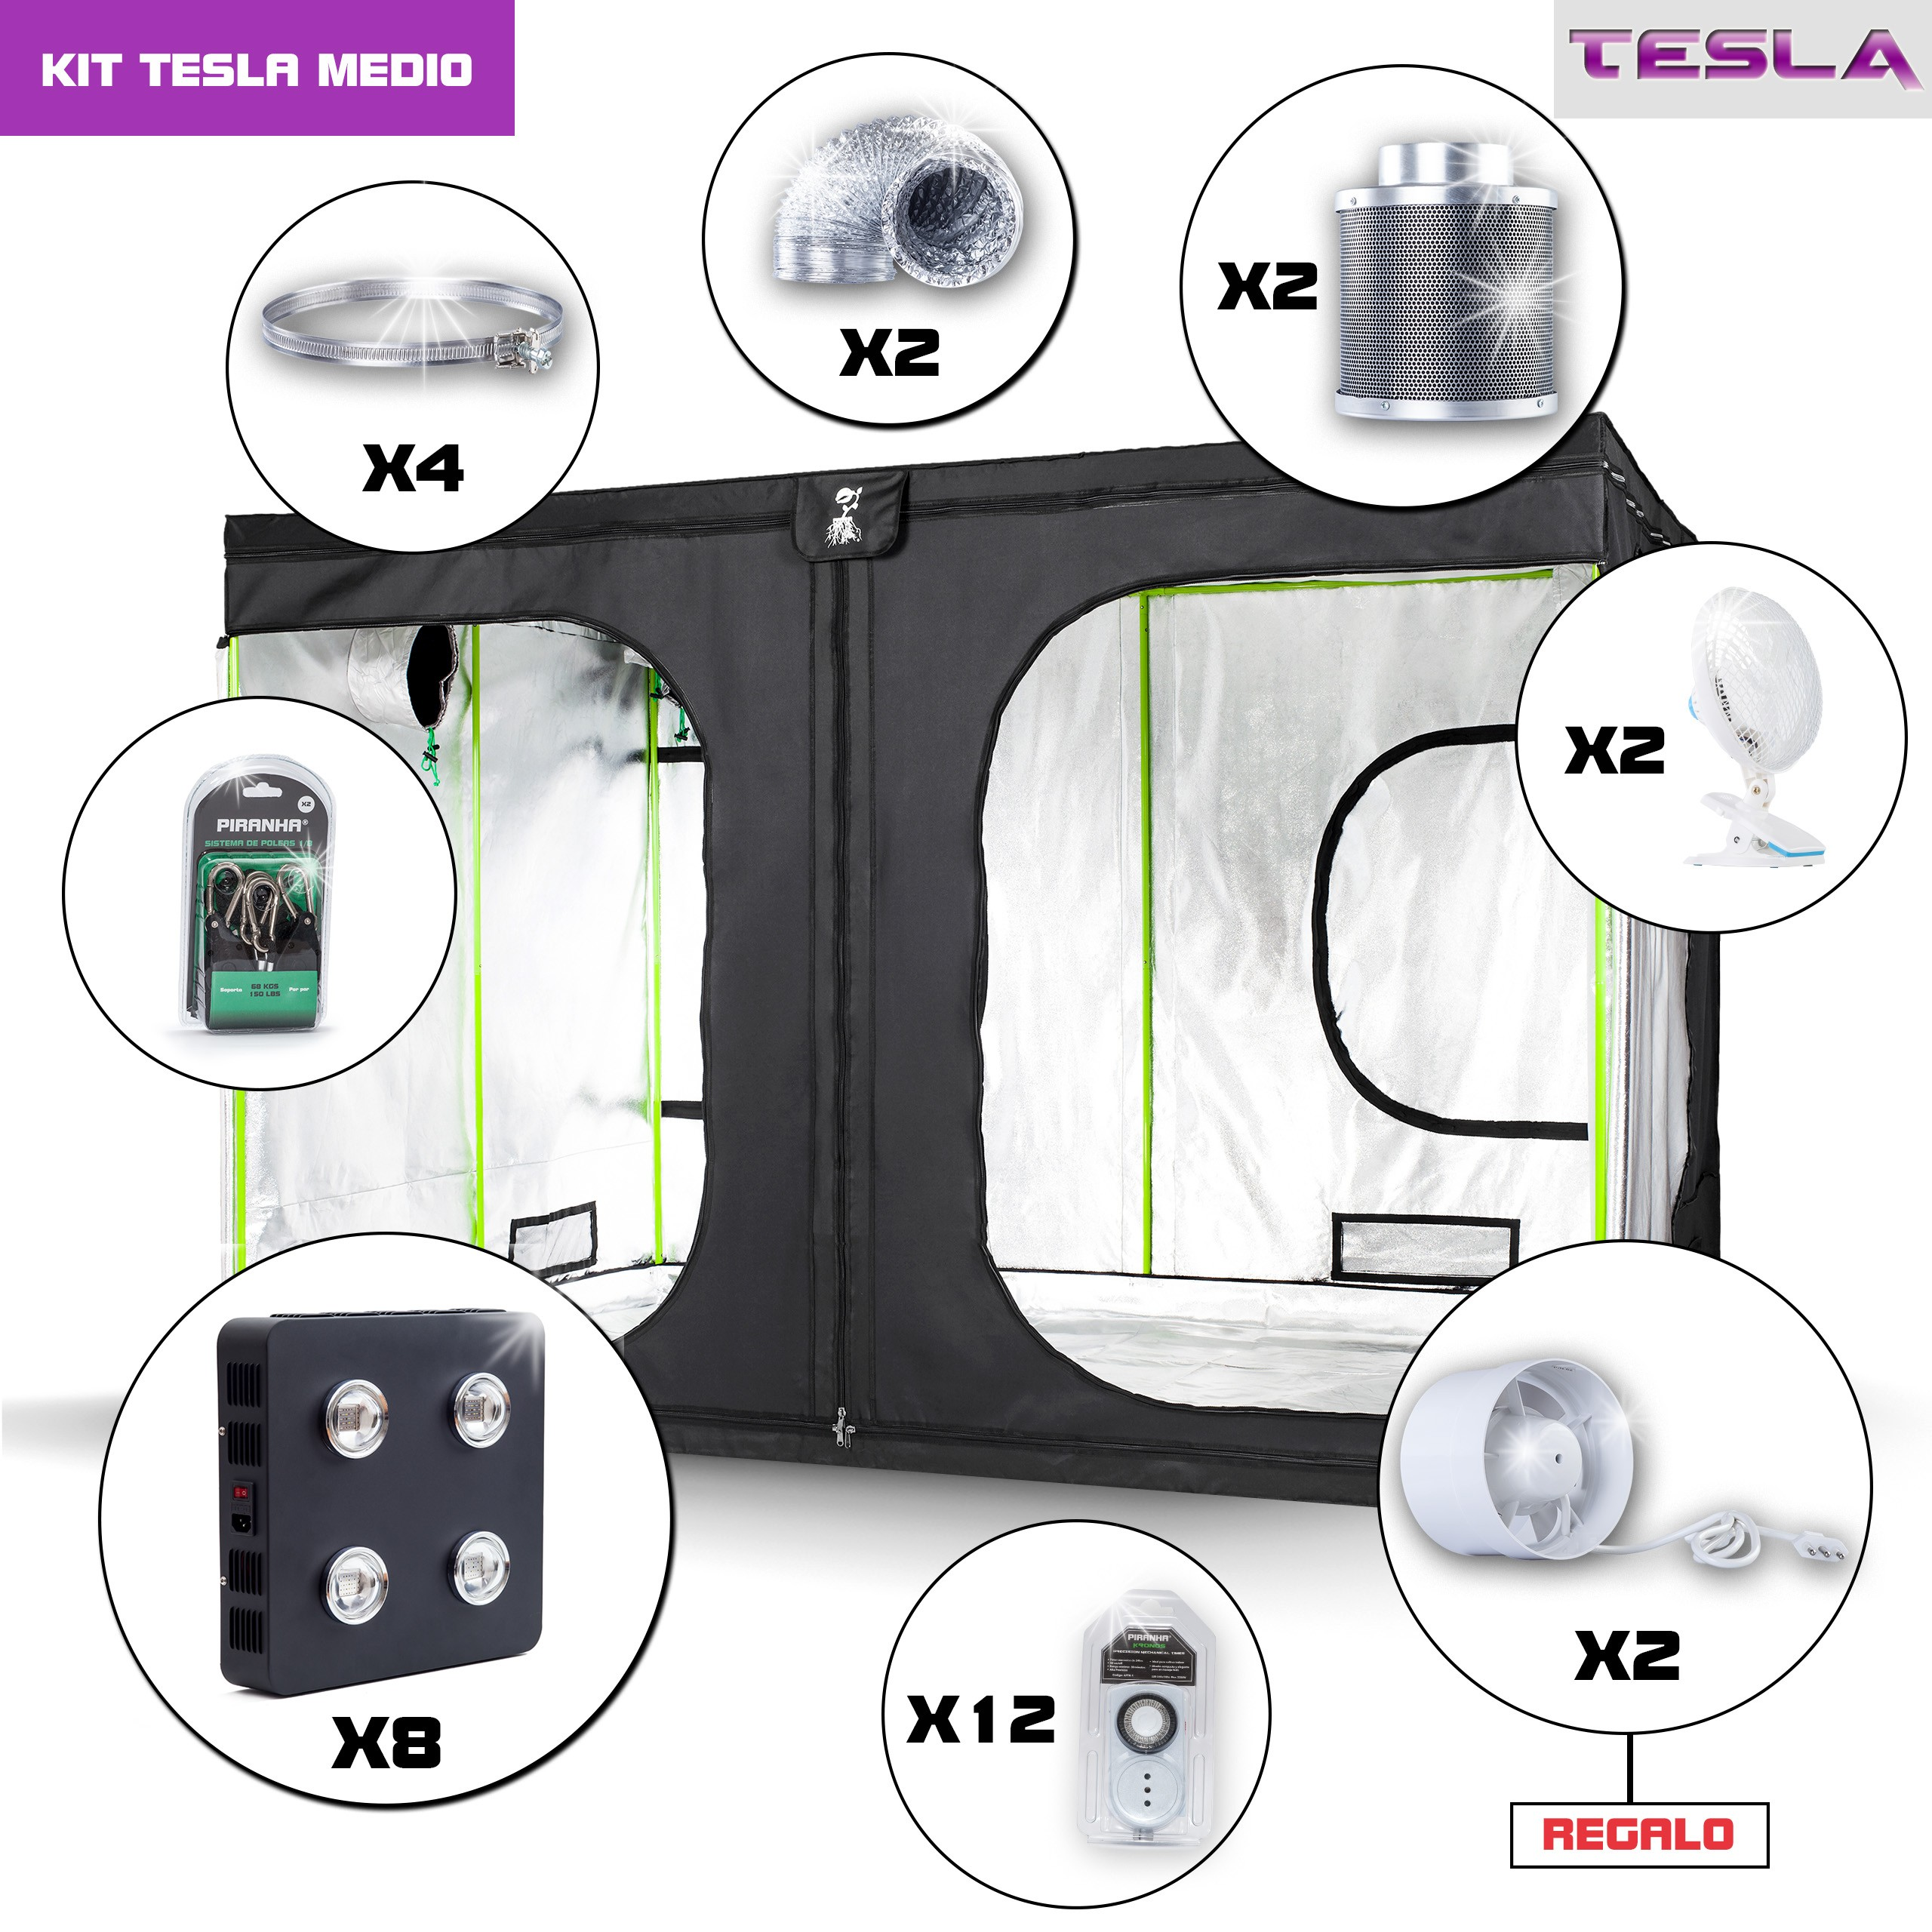 Kit Tesla Monster 3 - 2880W Completo